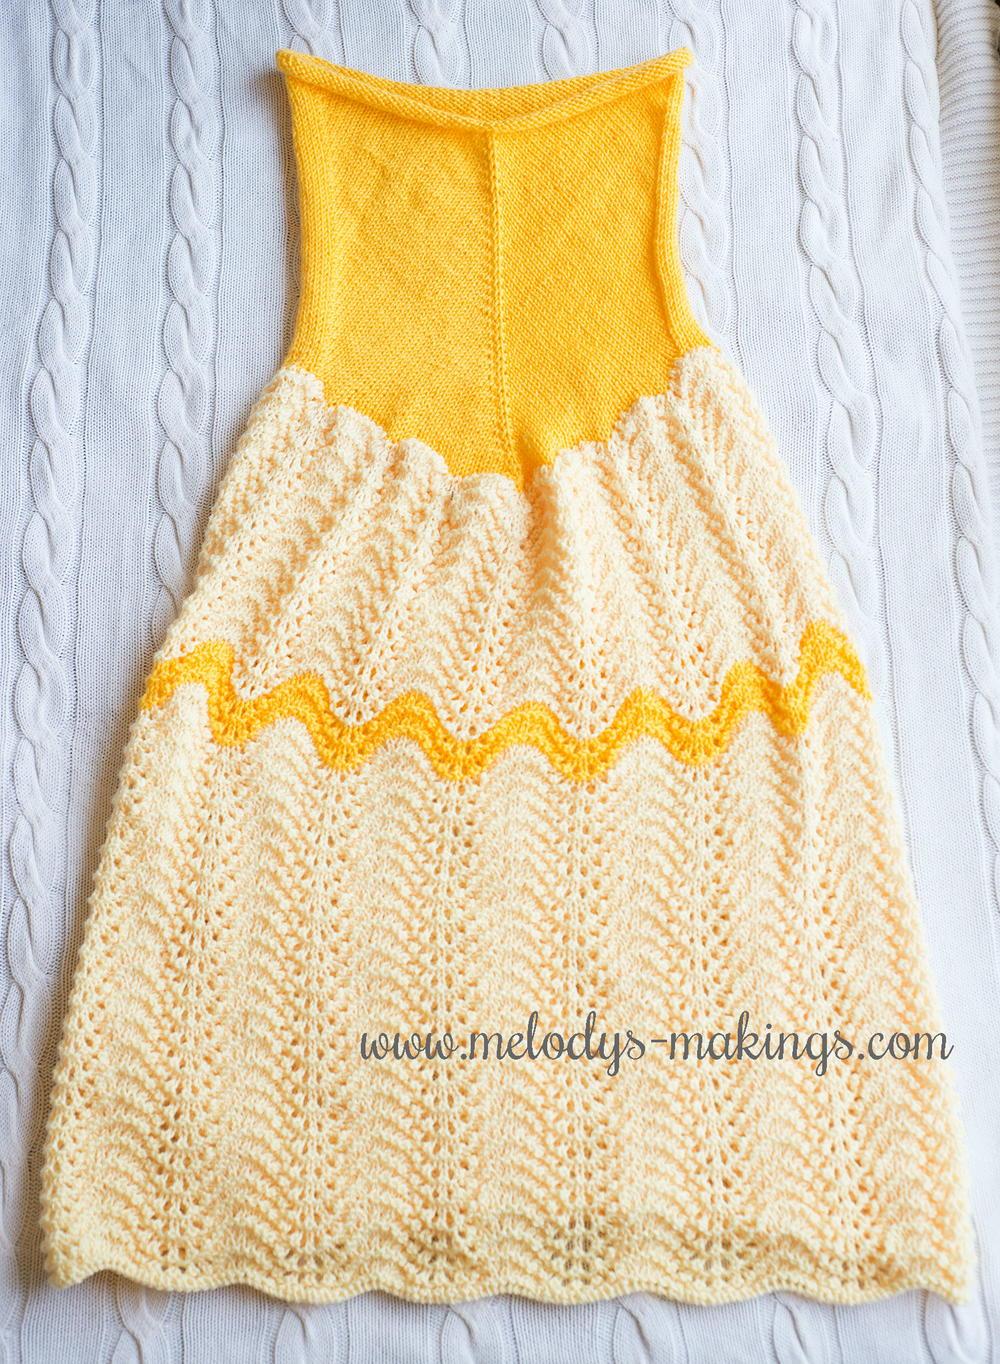 Crochet Pattern Princess Dress Blanket : Princess Dress Blanket AllFreeKnitting.com